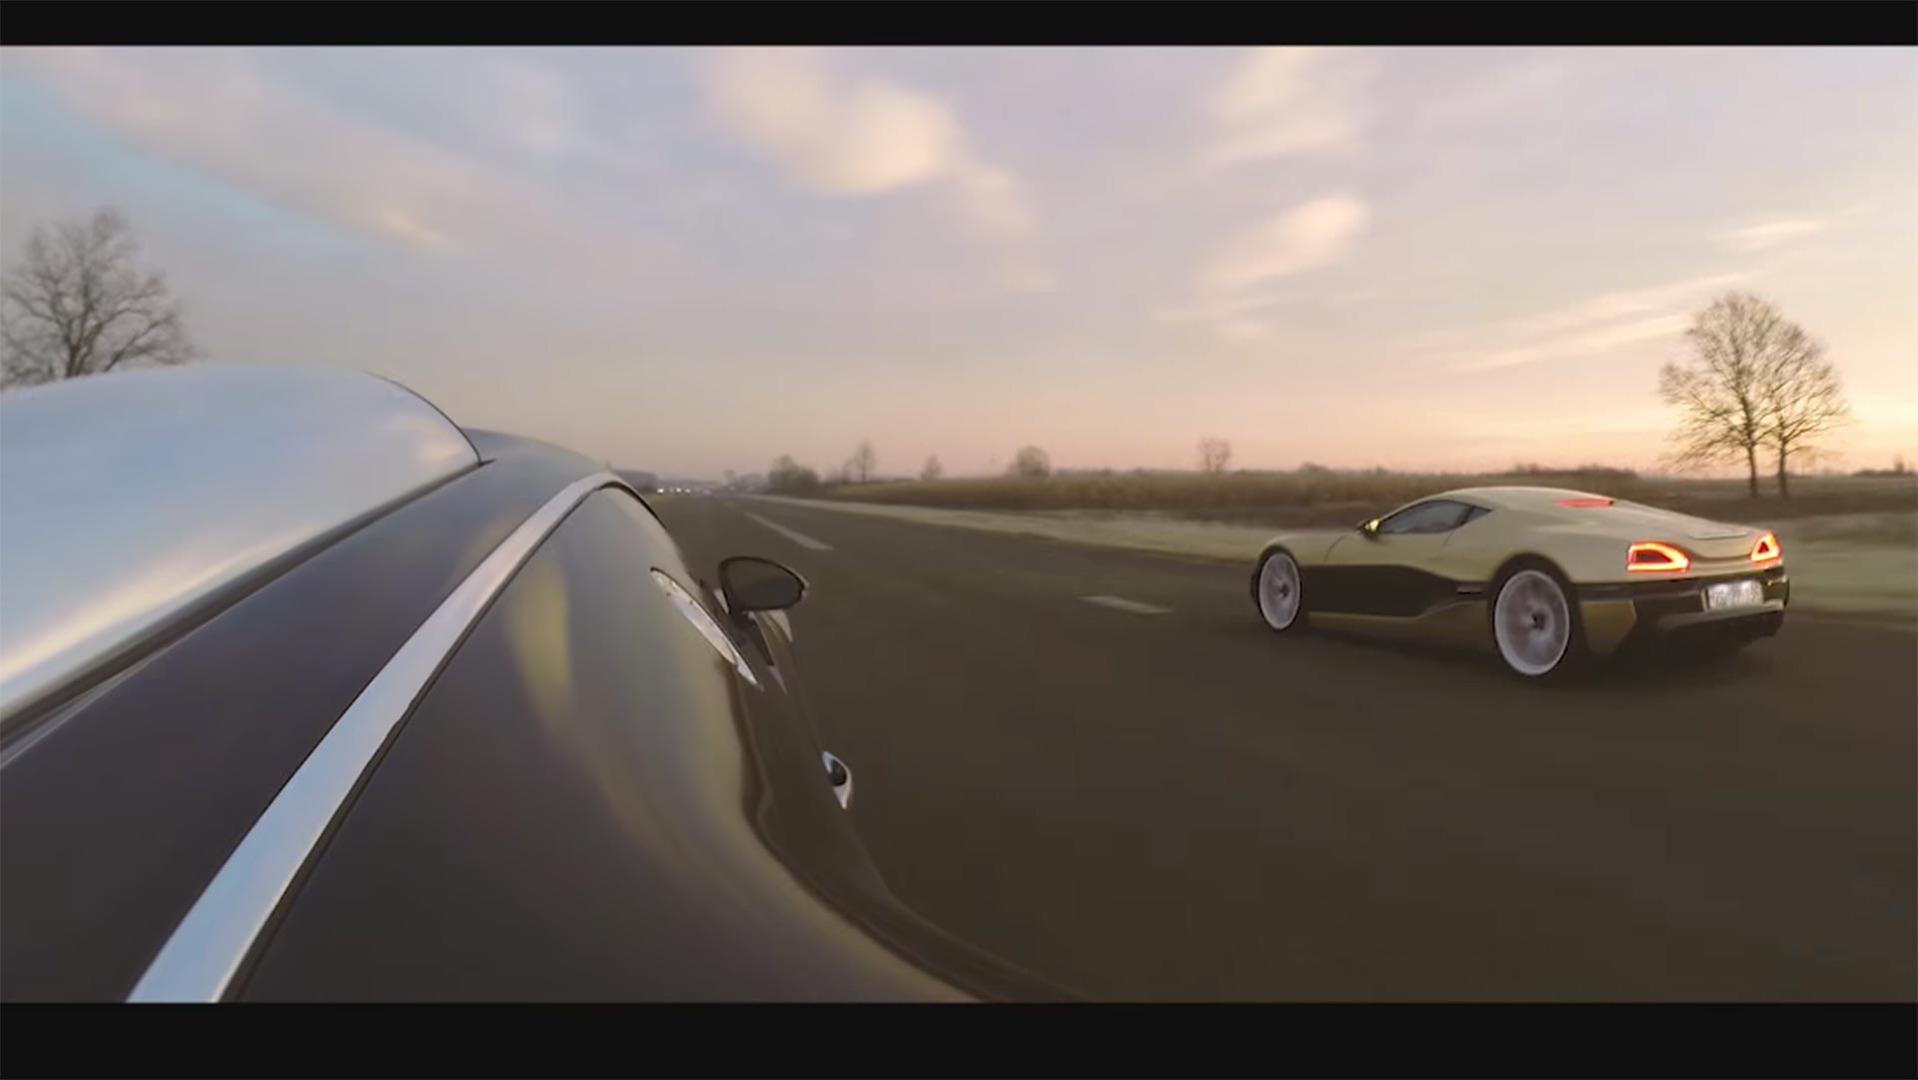 bugatti-veyron-and-rimac-race Wonderful Bugatti Veyron On Road Price Cars Trend